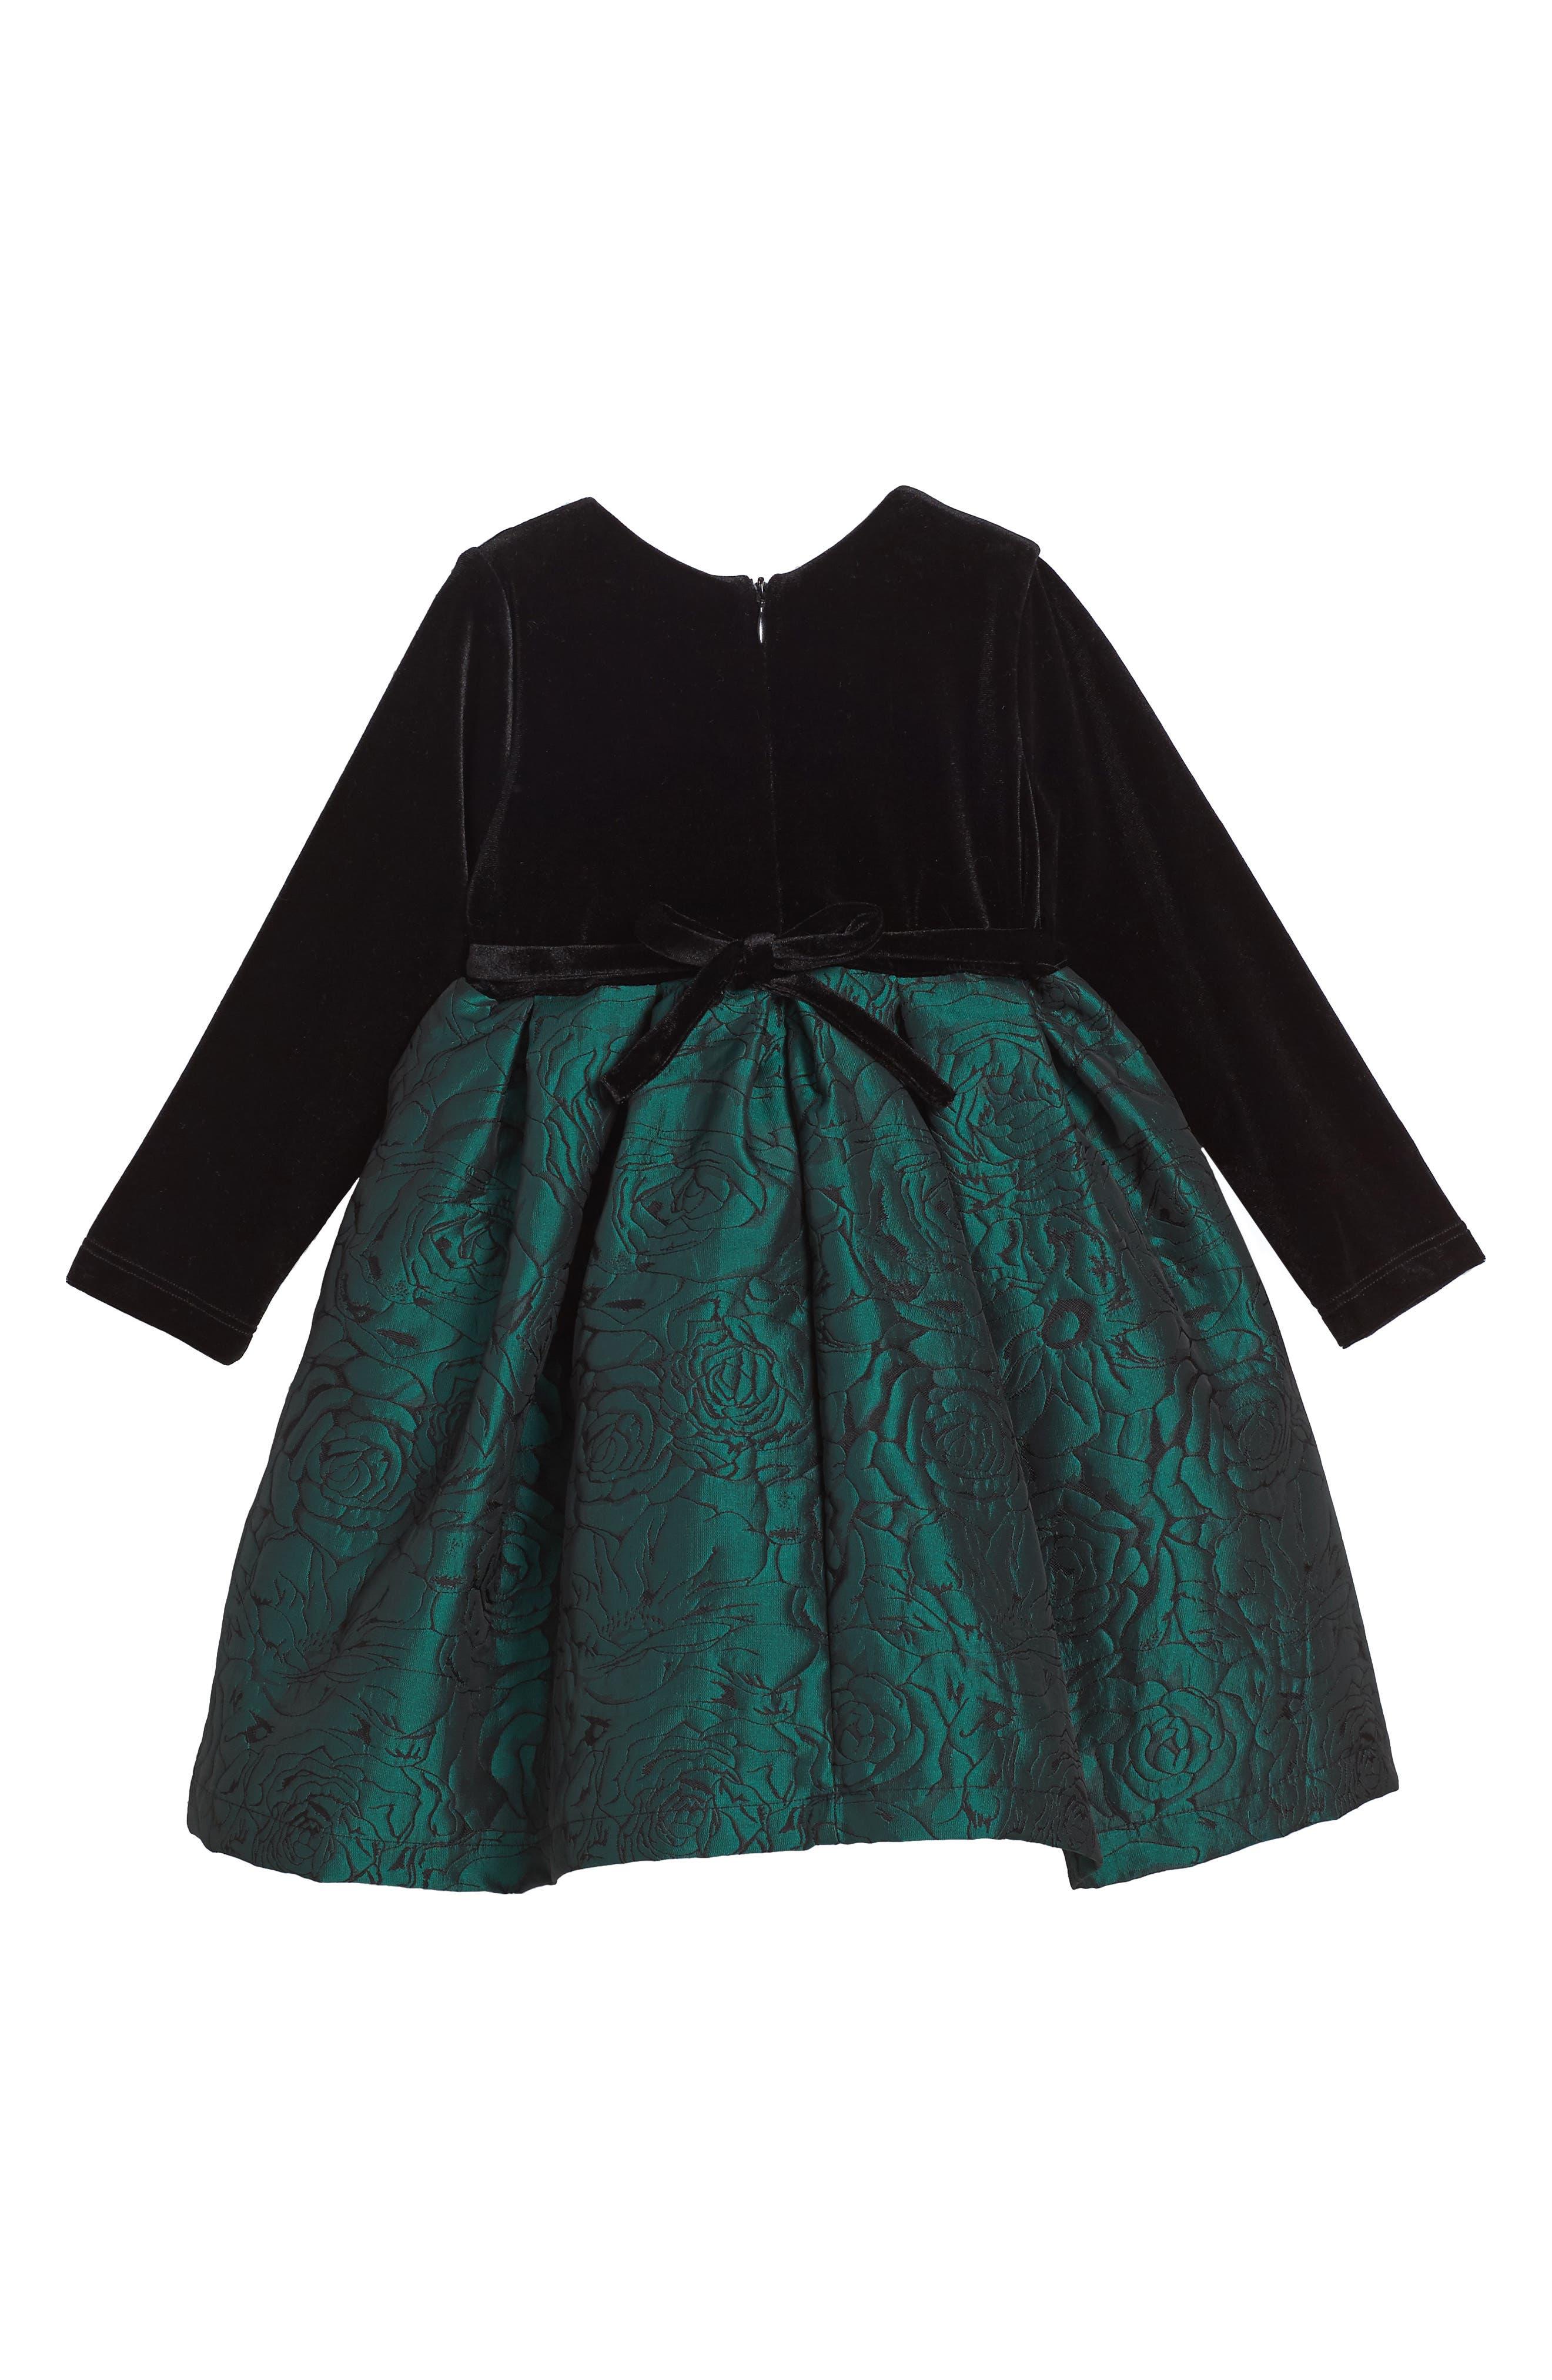 Mistletoe Dress,                             Alternate thumbnail 2, color,                             300